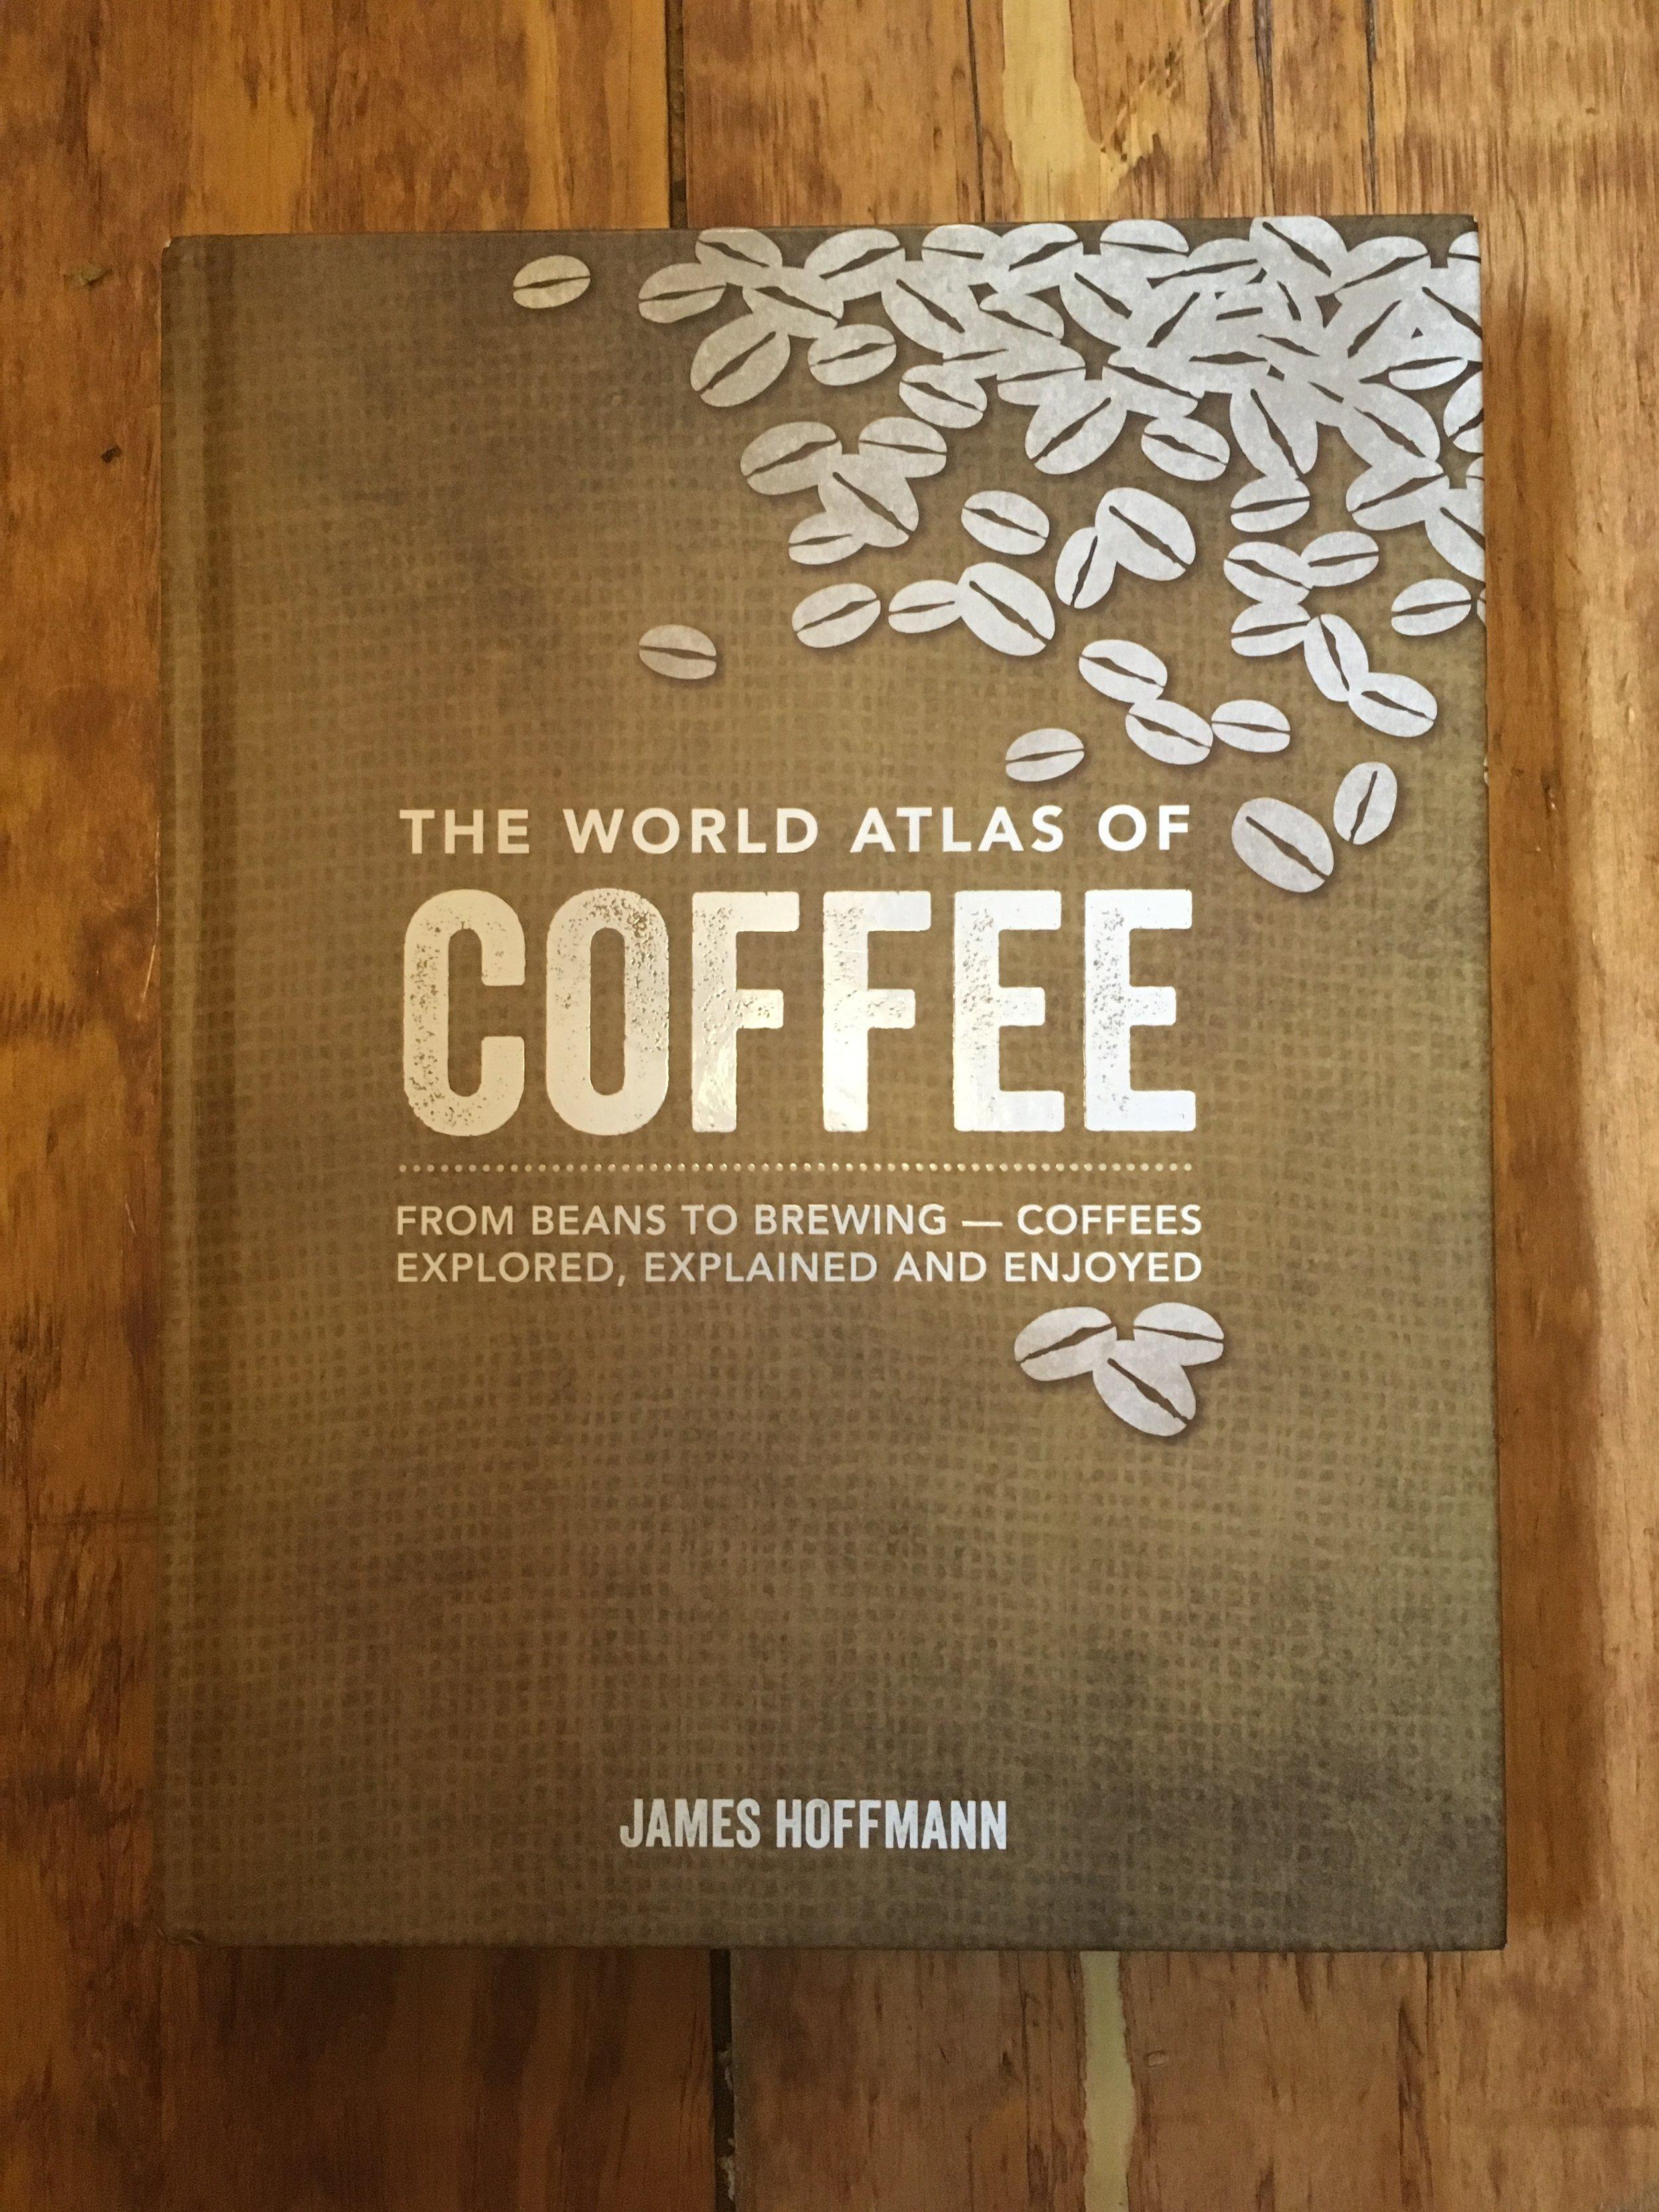 If you like coffee, buy this book on  Amazon!